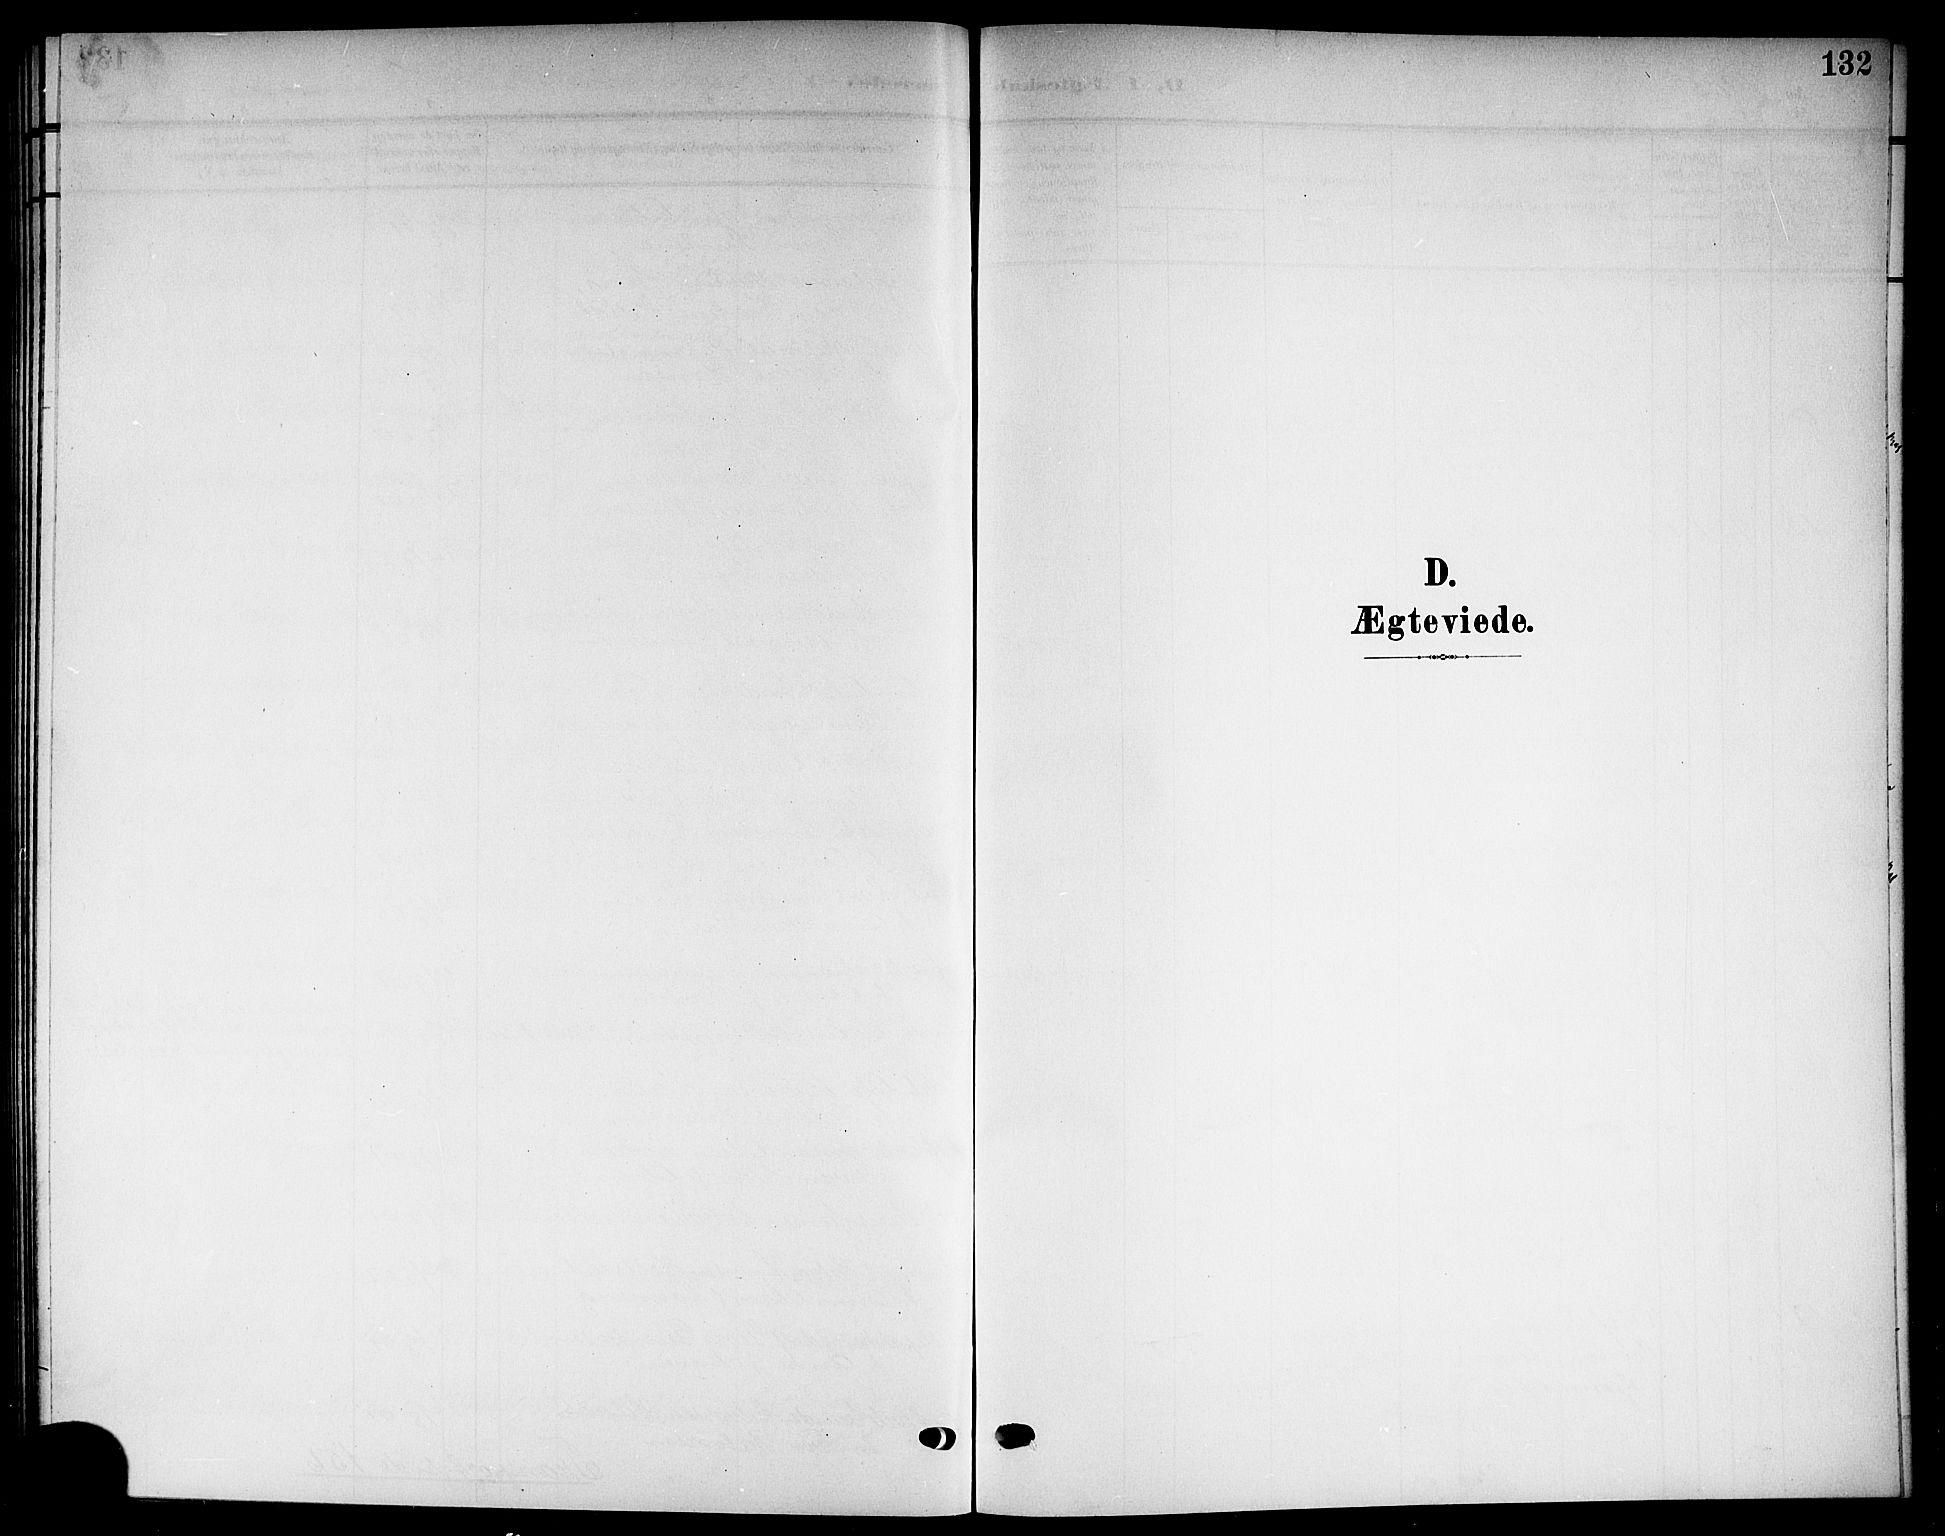 SAKO, Solum kirkebøker, G/Gb/L0005: Klokkerbok nr. II 5, 1905-1914, s. 132